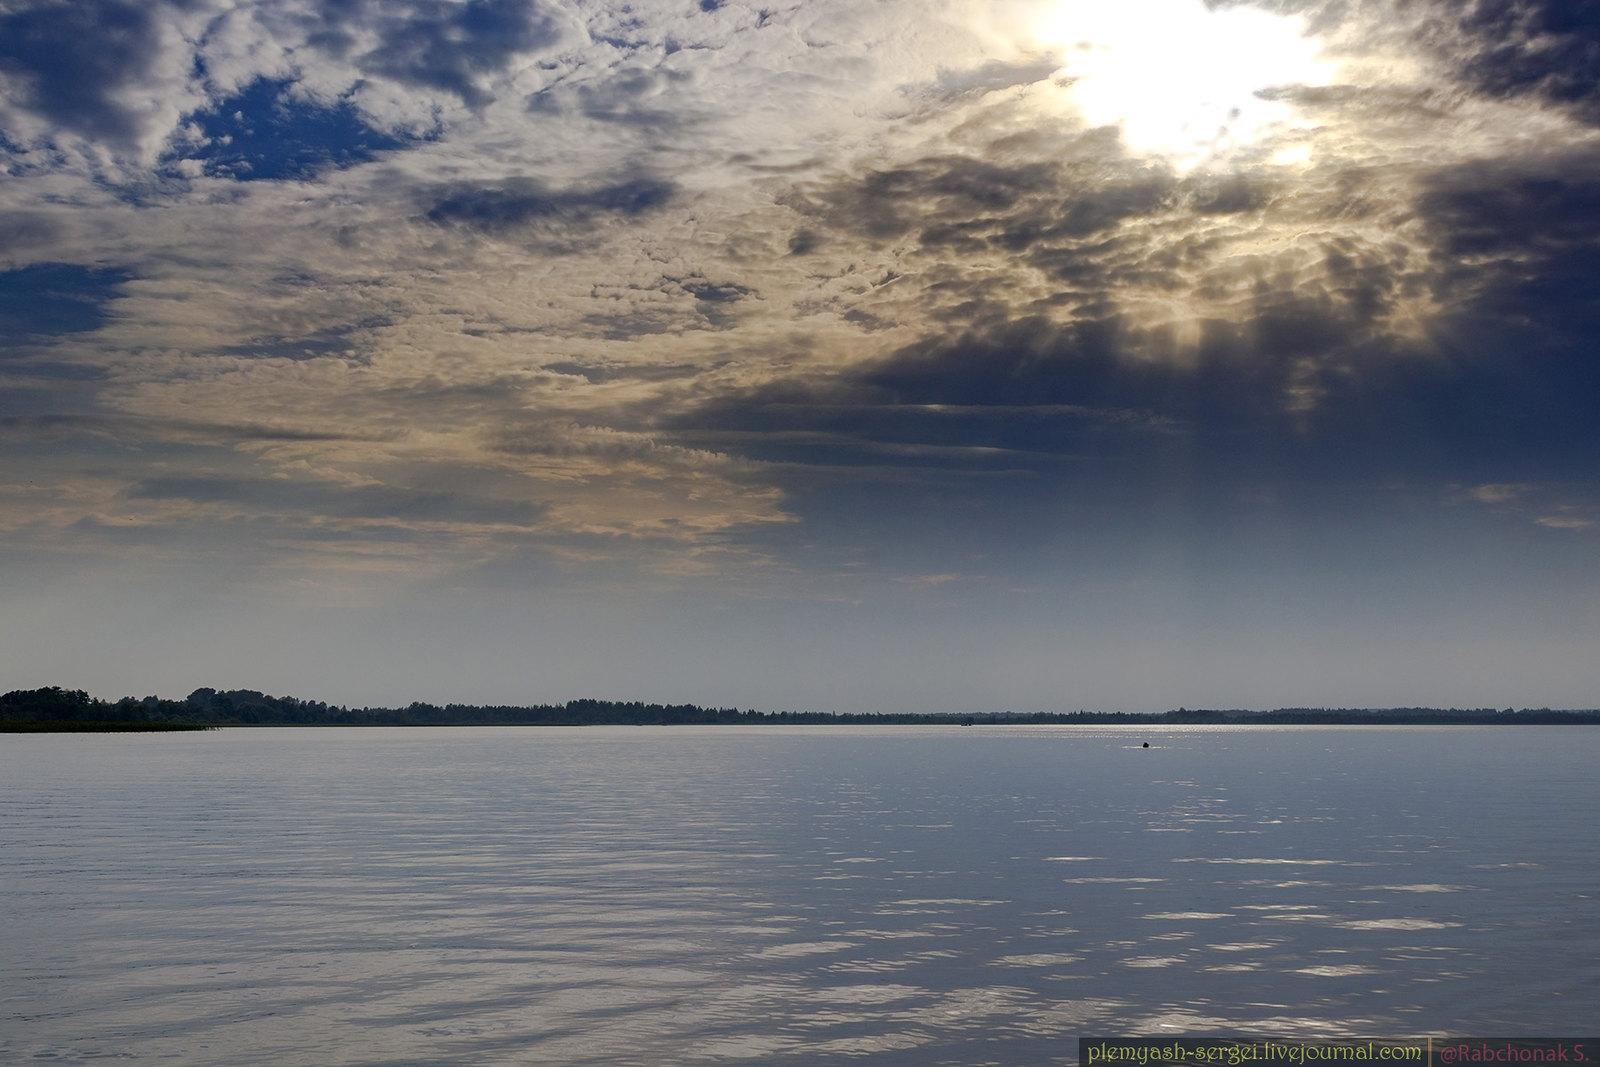 Polozer'e lake